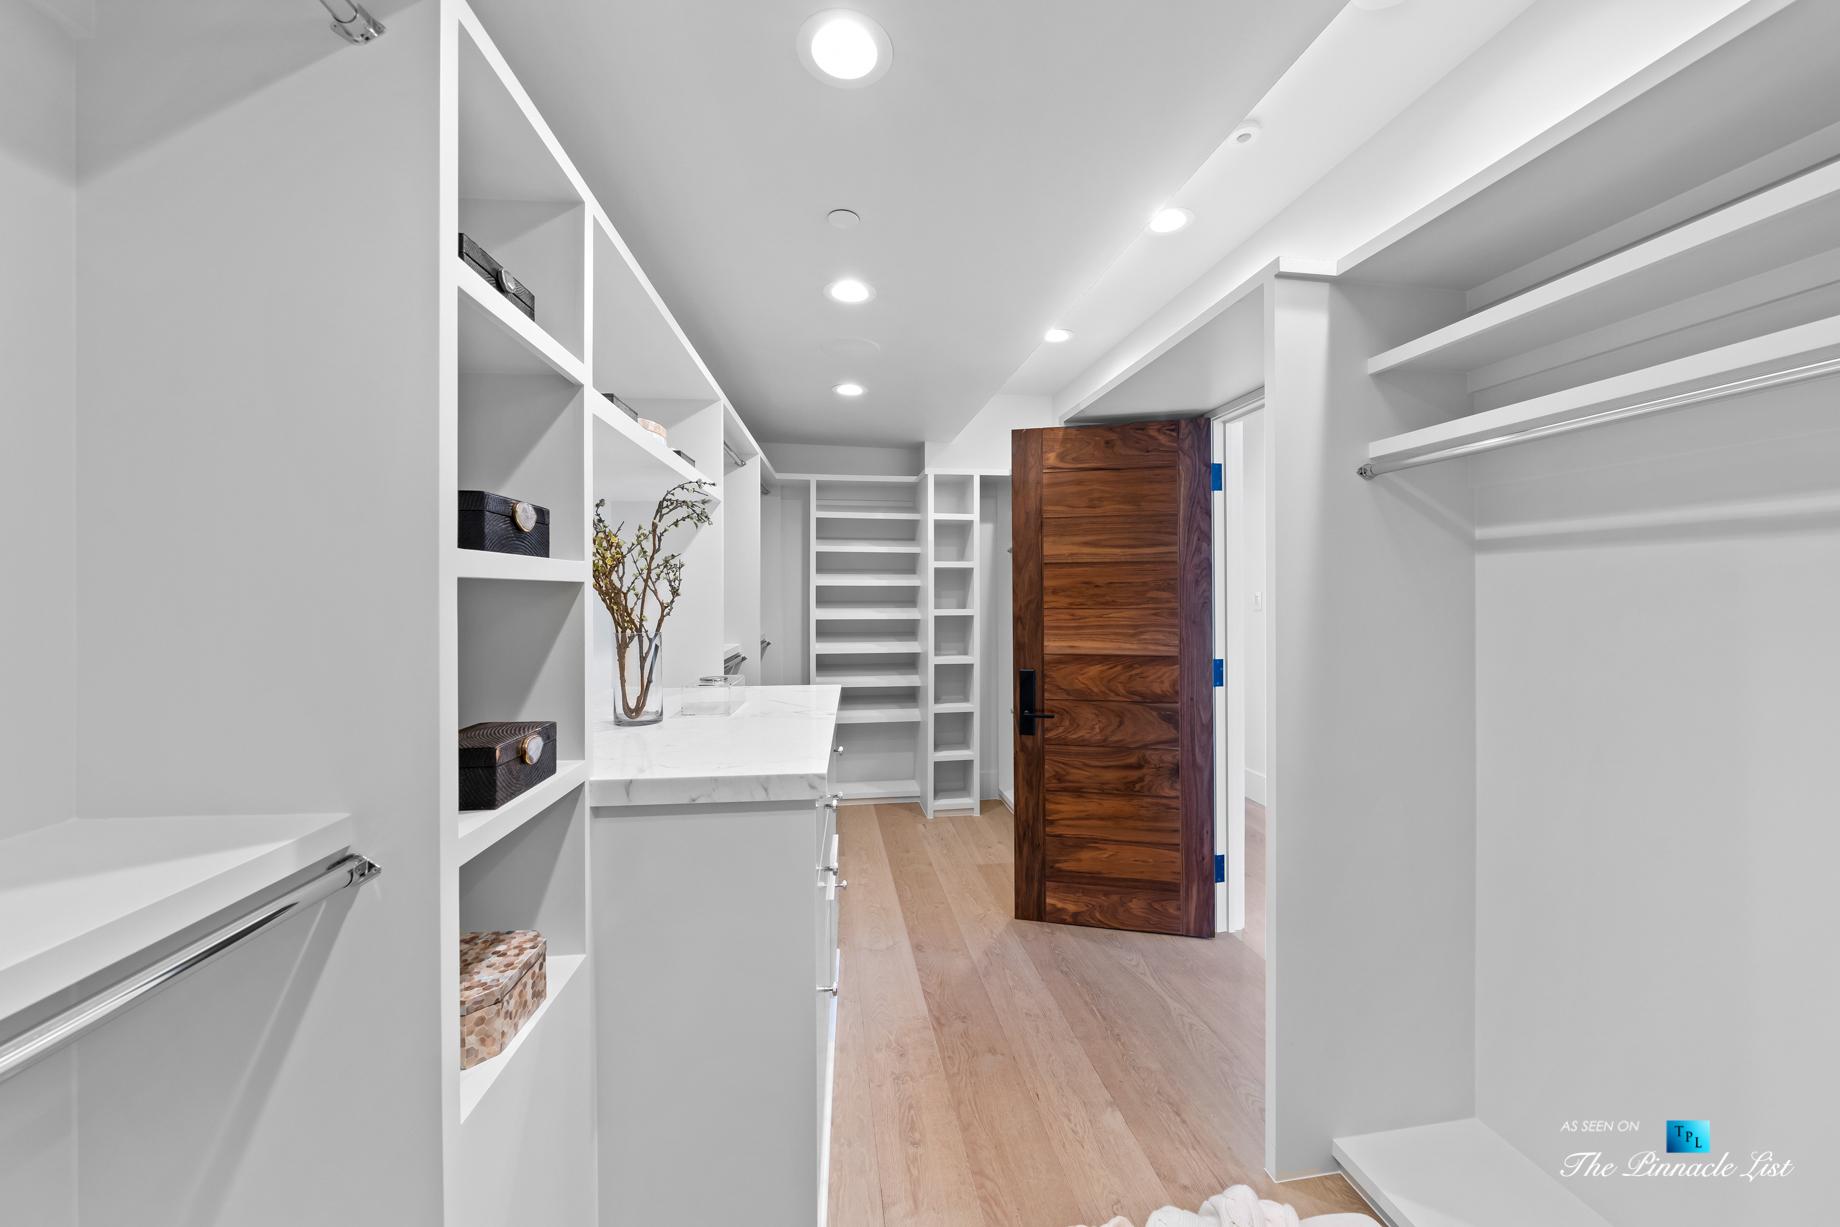 508 The Strand, Manhattan Beach, CA, USA – Master Bedroom Walk In Closet – Luxury Real Estate – Oceanfront Home